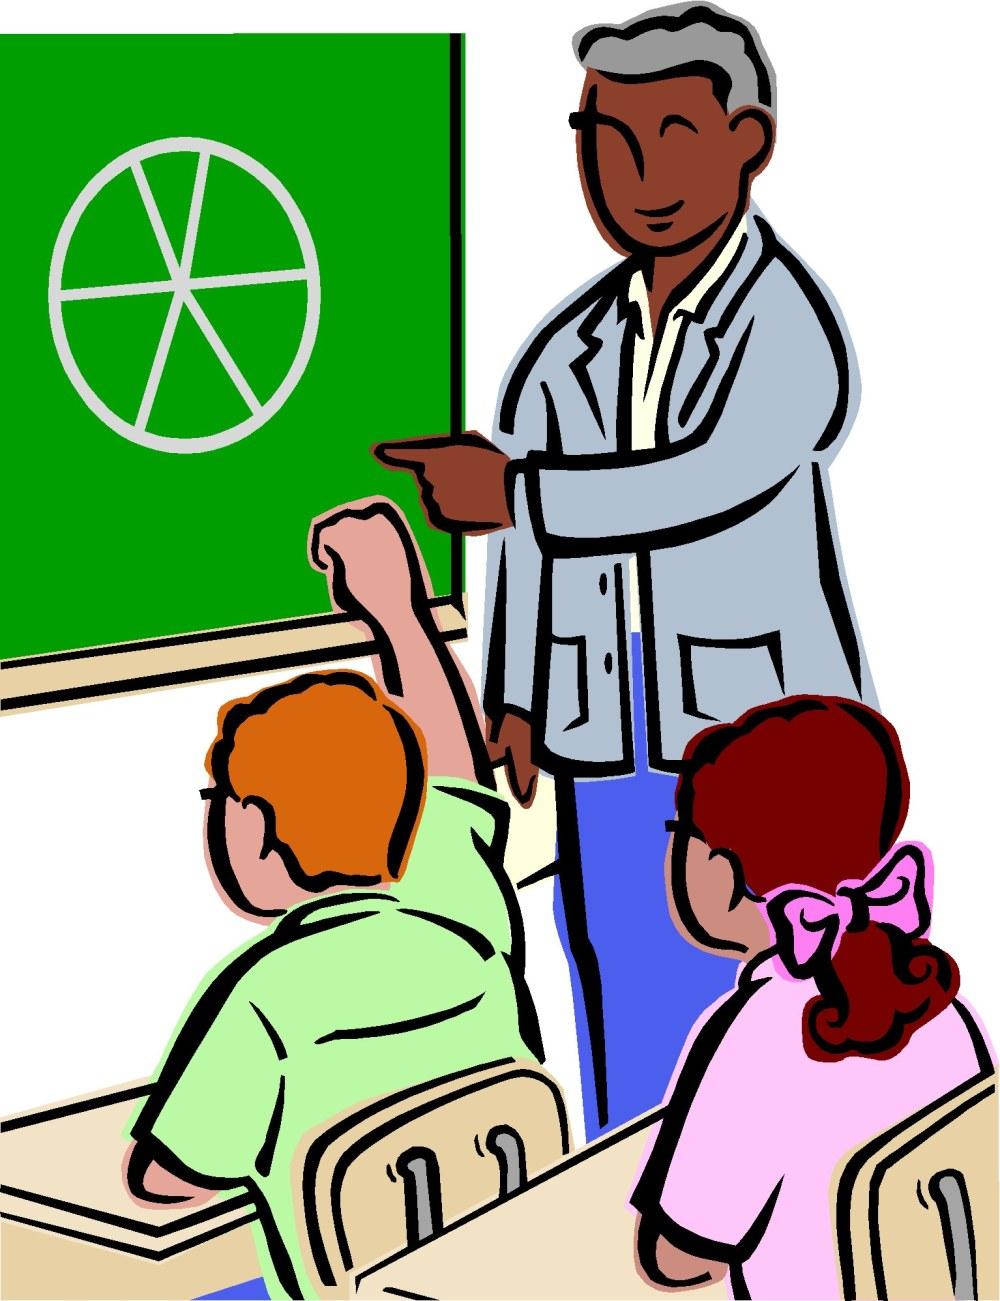 medium resolution of teacher helping student clipart